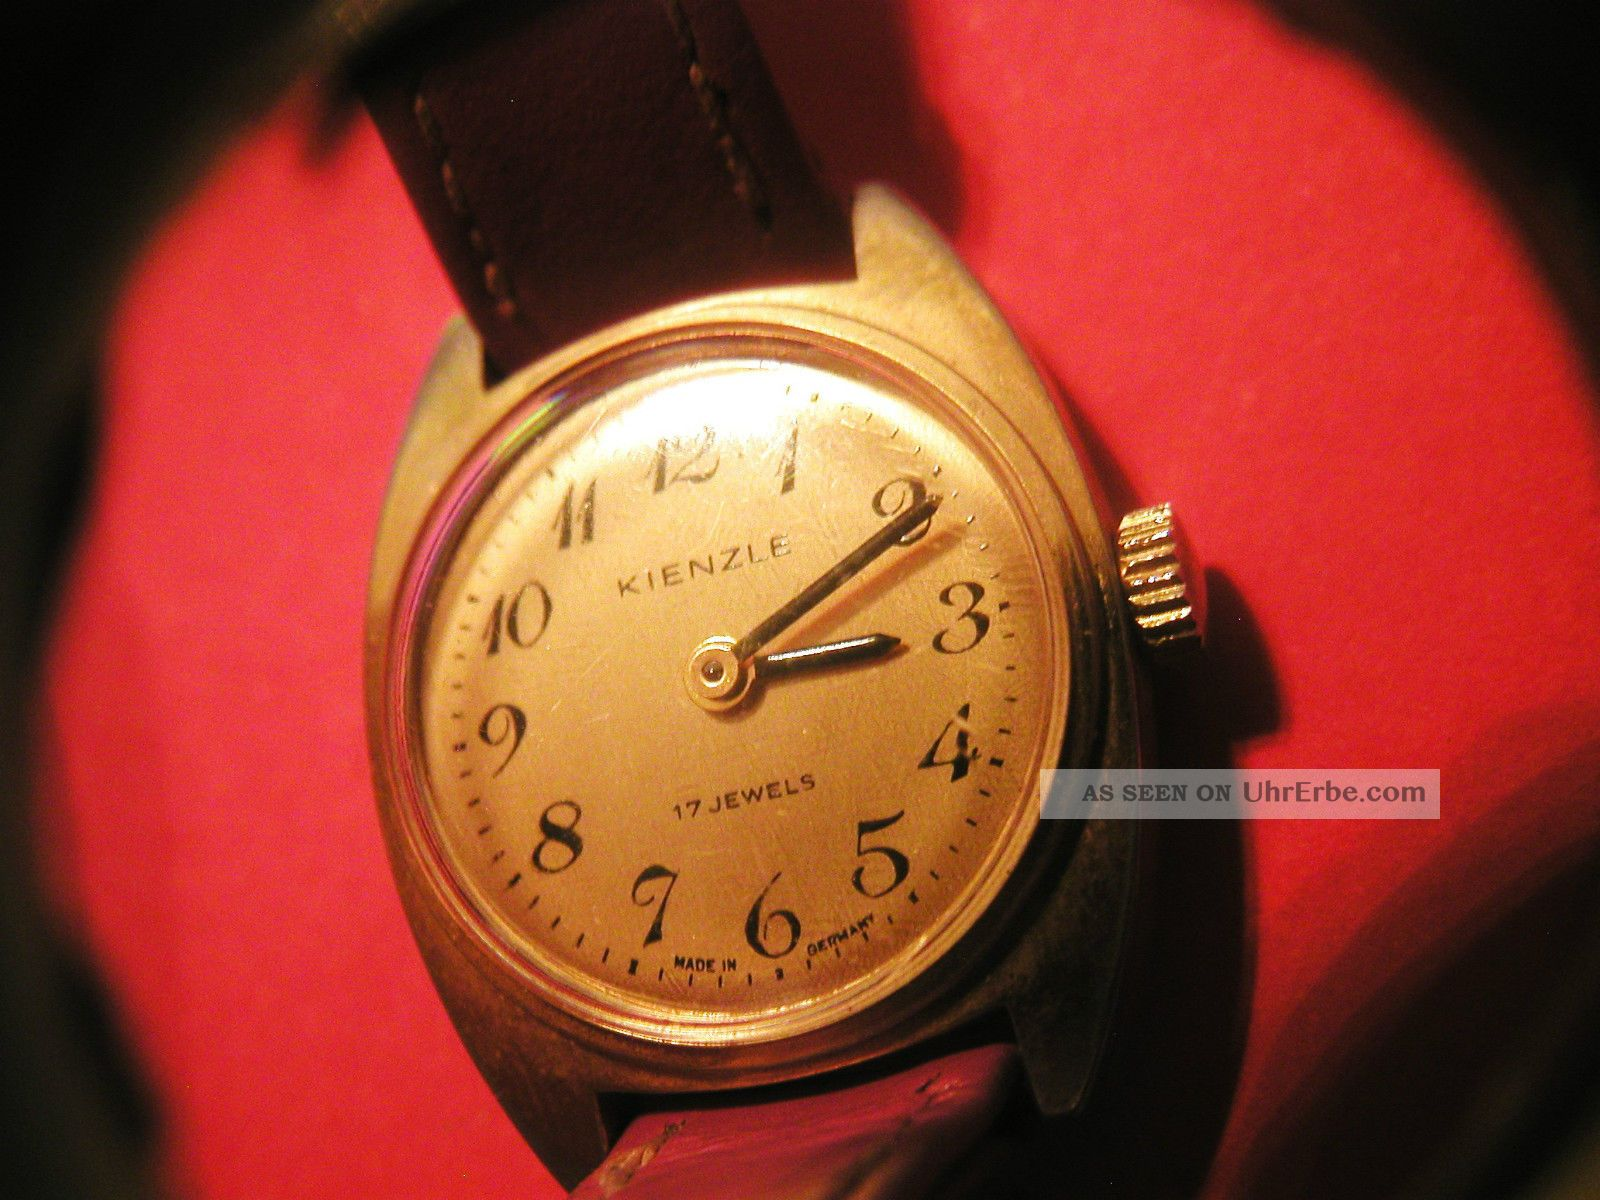 Armbanduhr Kienzle Damenuhr Läuft 17 Jewels Lederarmband Gold - Farbig Handaufzug Armbanduhren Bild